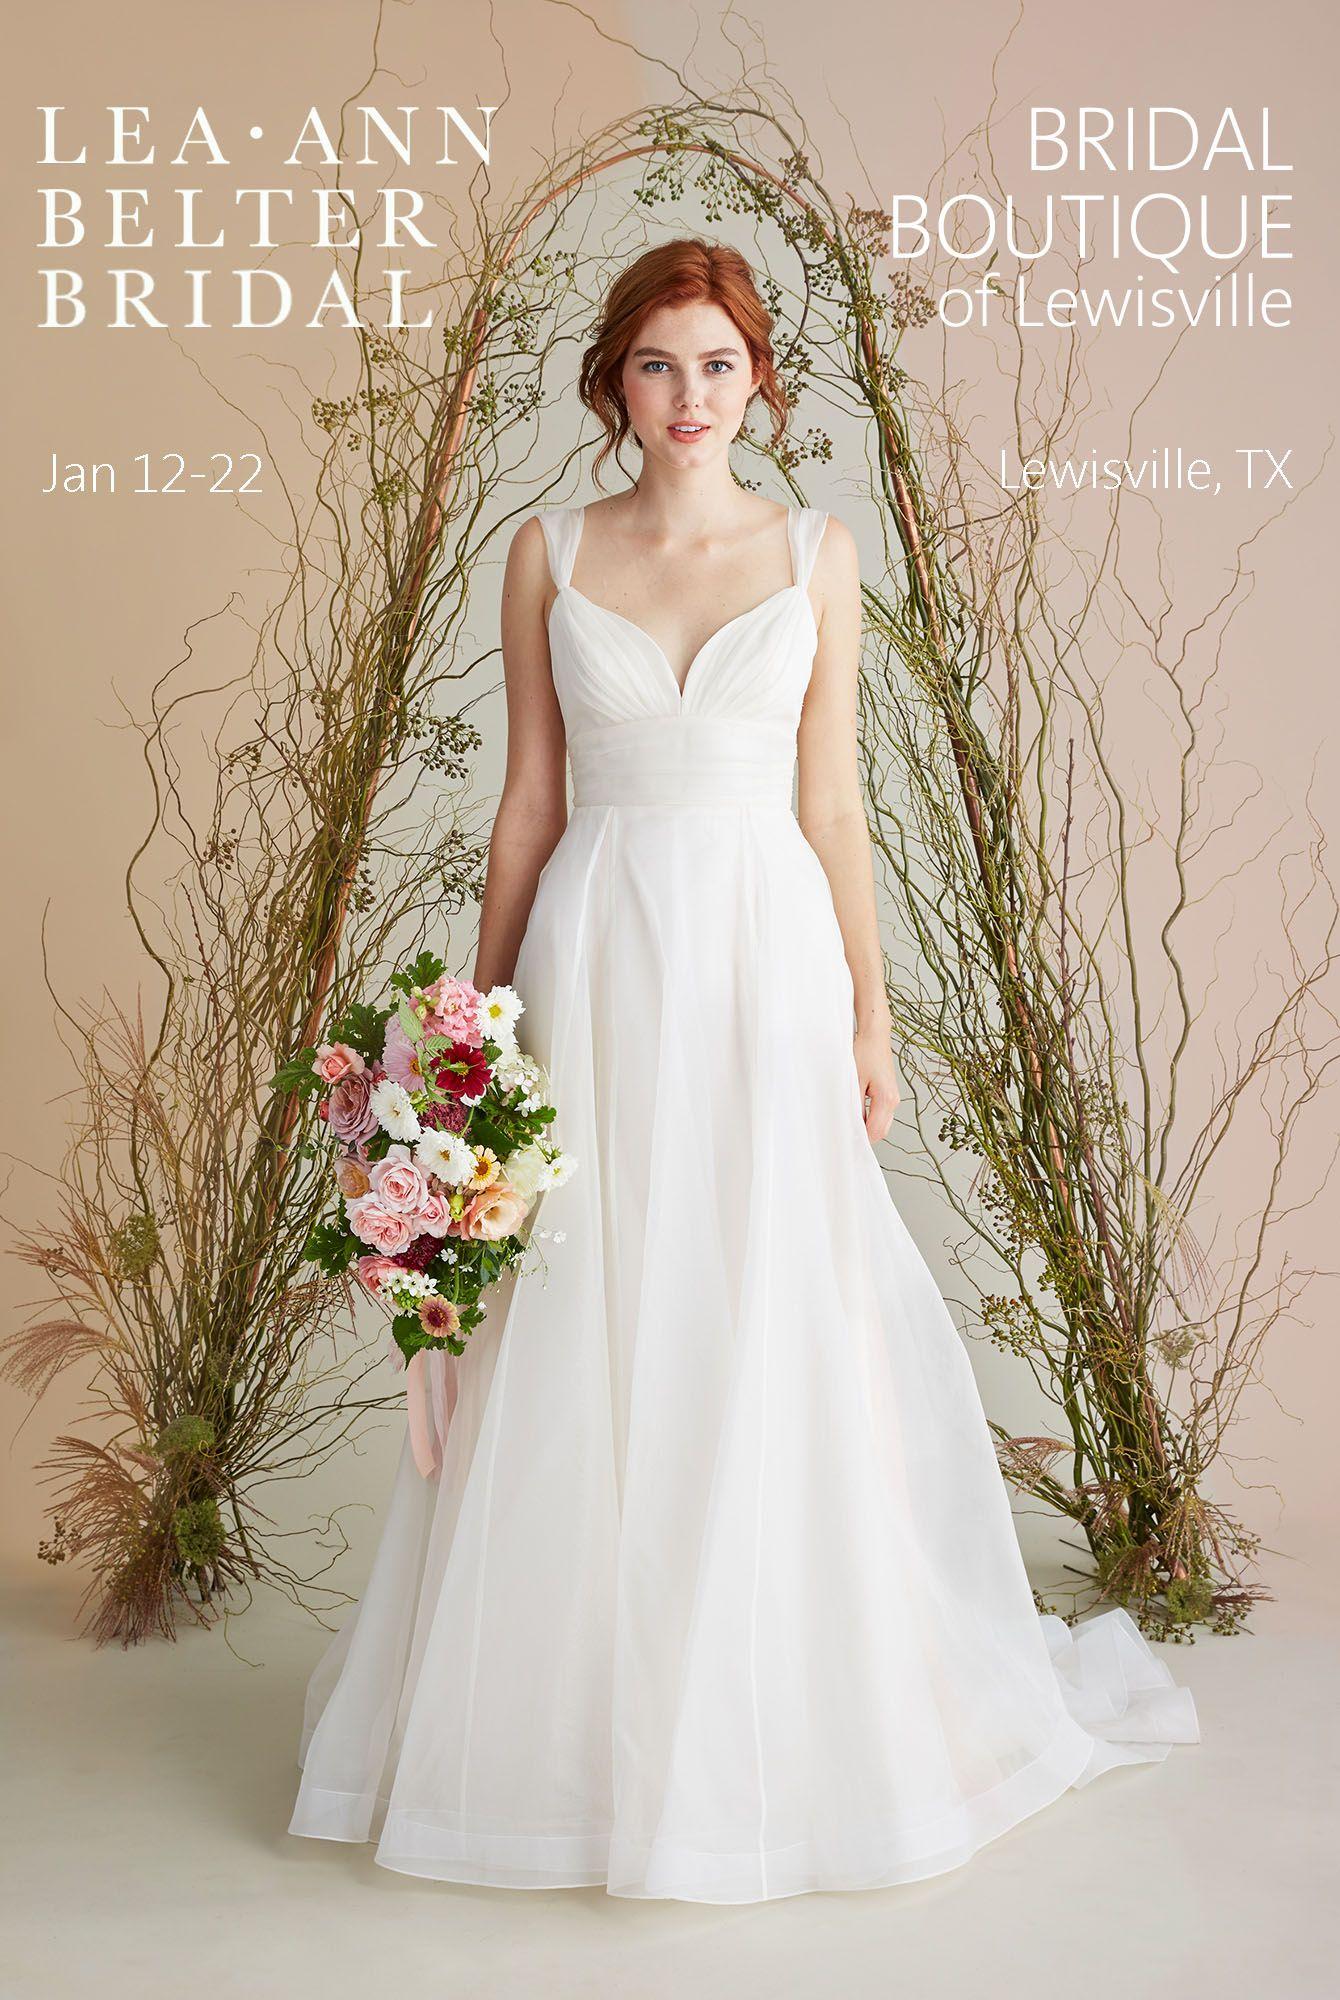 Bridal Gown Trunk Show In Dallas Bridal Boutique Lewisville Dallas